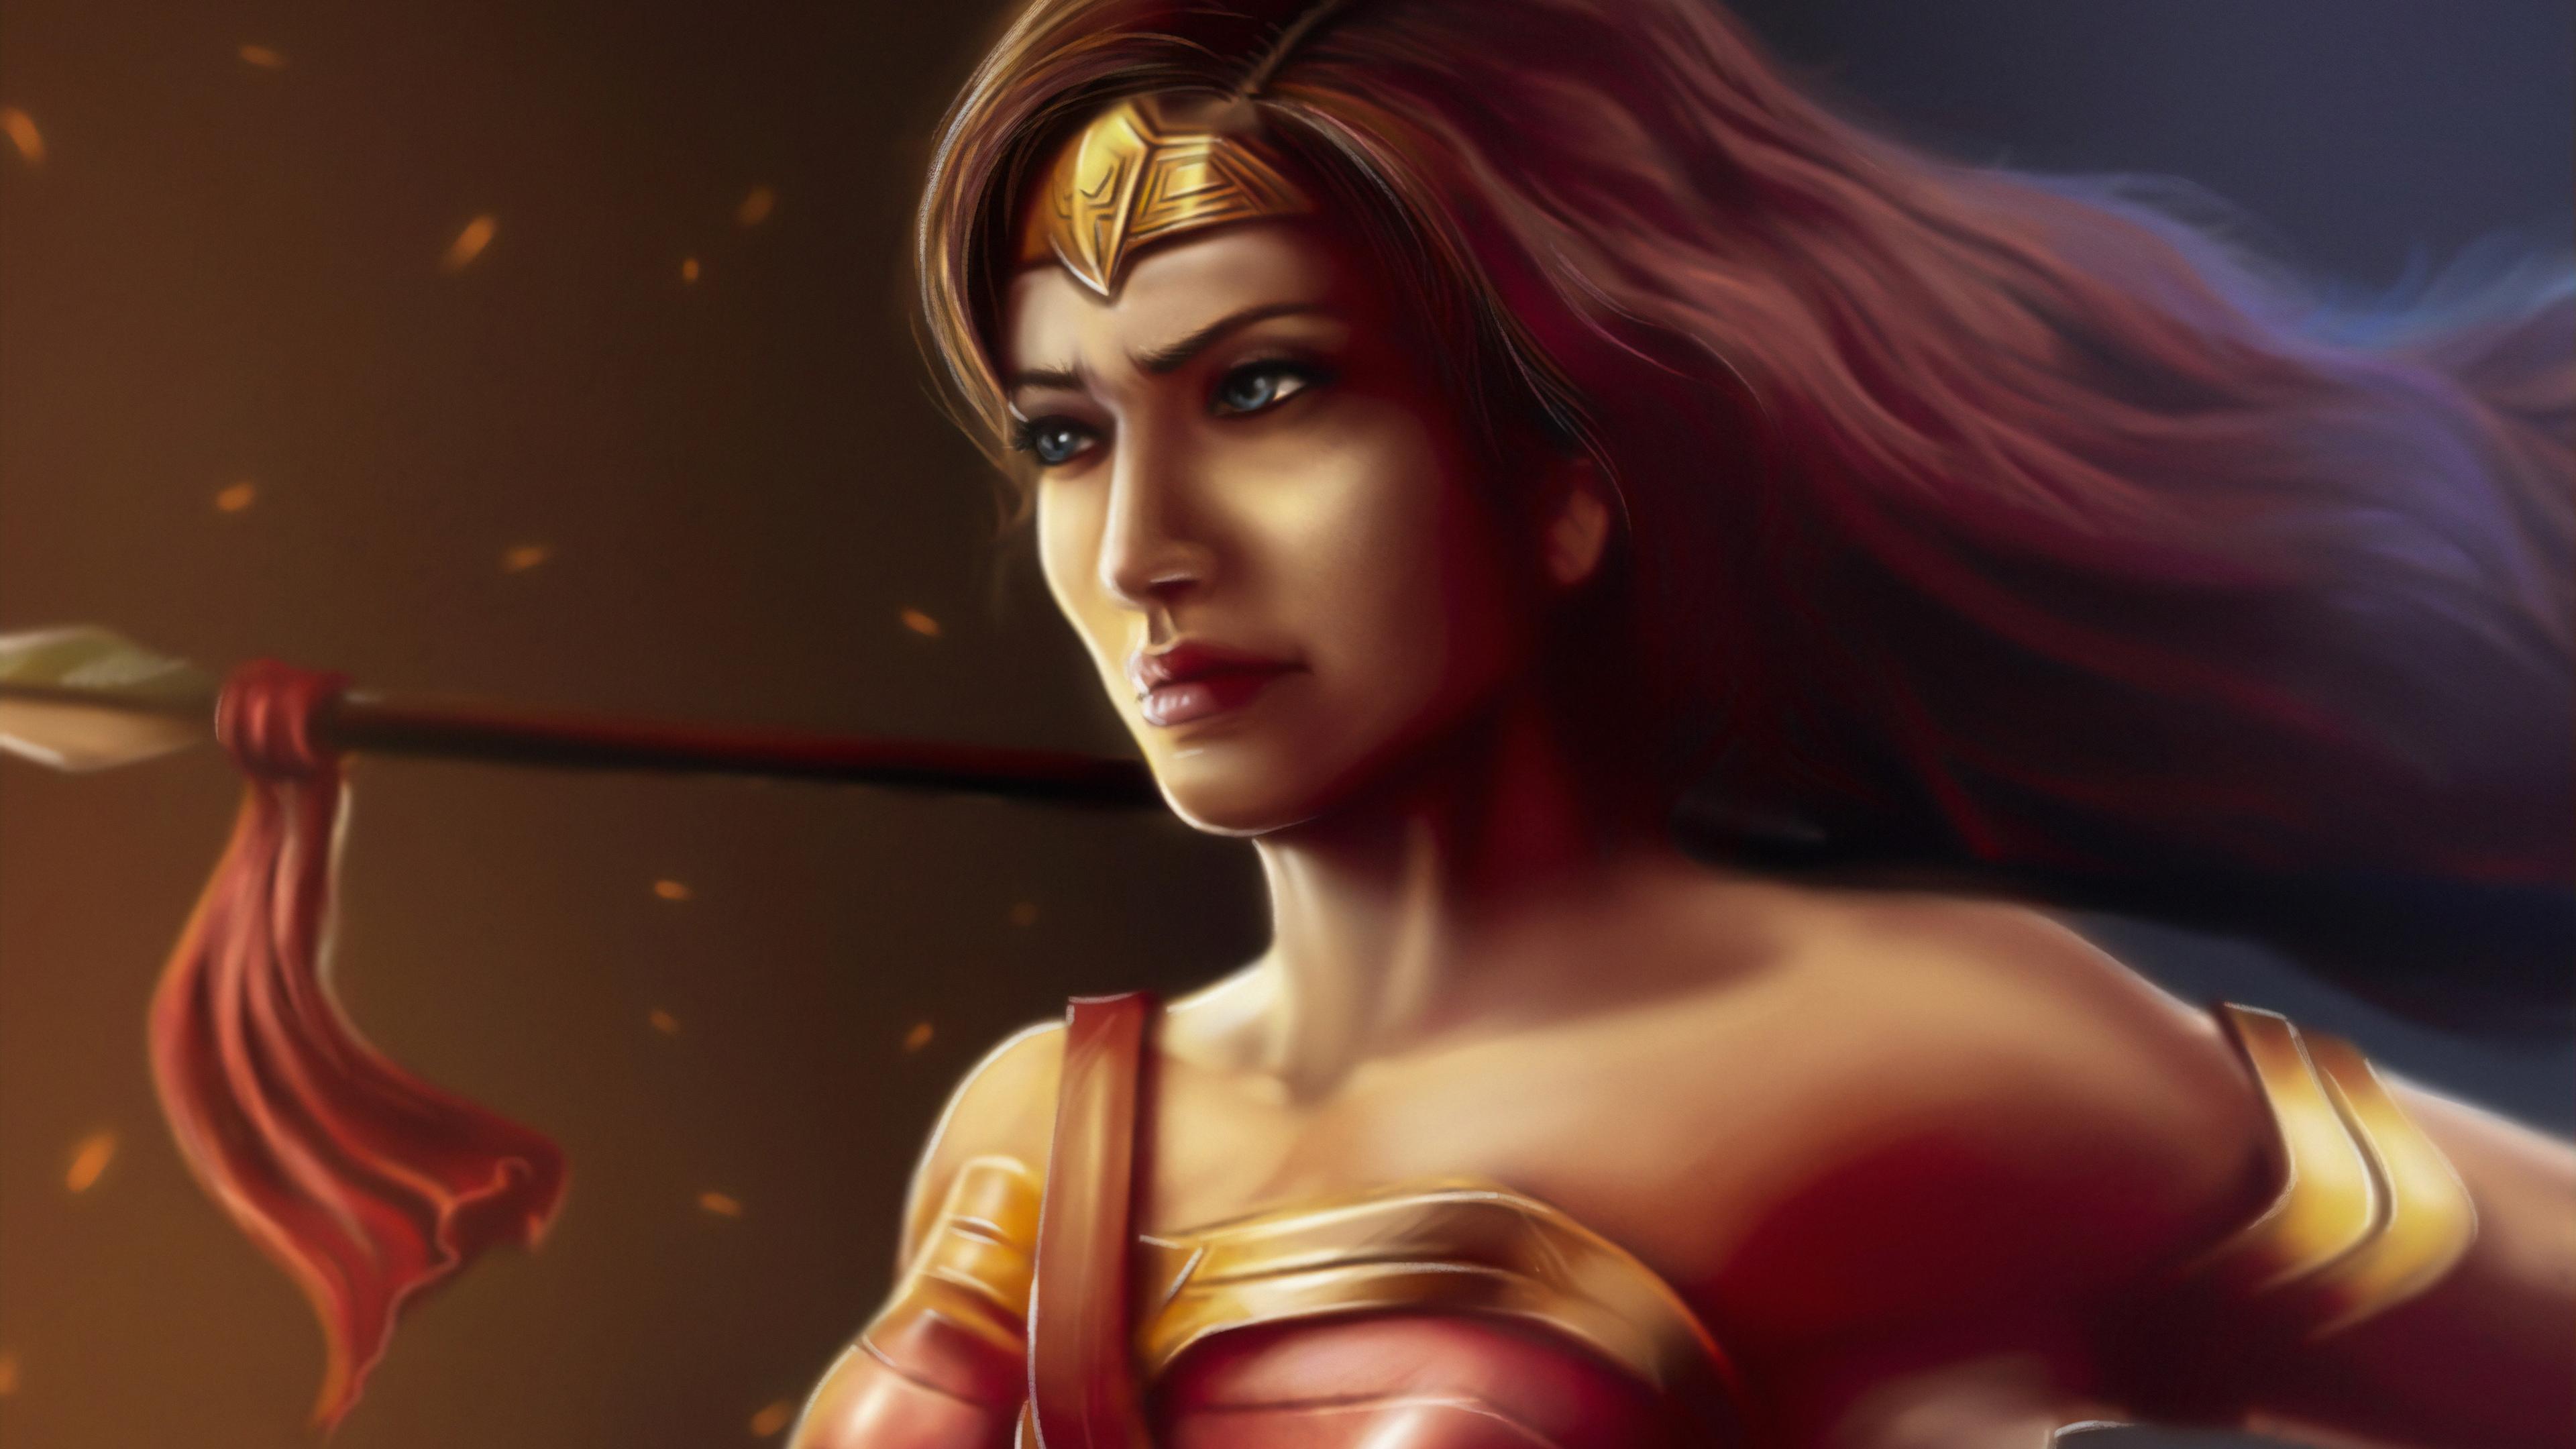 wonder woman ready to fight 1570393988 - Wonder Woman Ready To Fight - wonder woman wallpapers, superheroes wallpapers, hd-wallpapers, digital art wallpapers, artwork wallpapers, artstation wallpapers, 4k-wallpapers